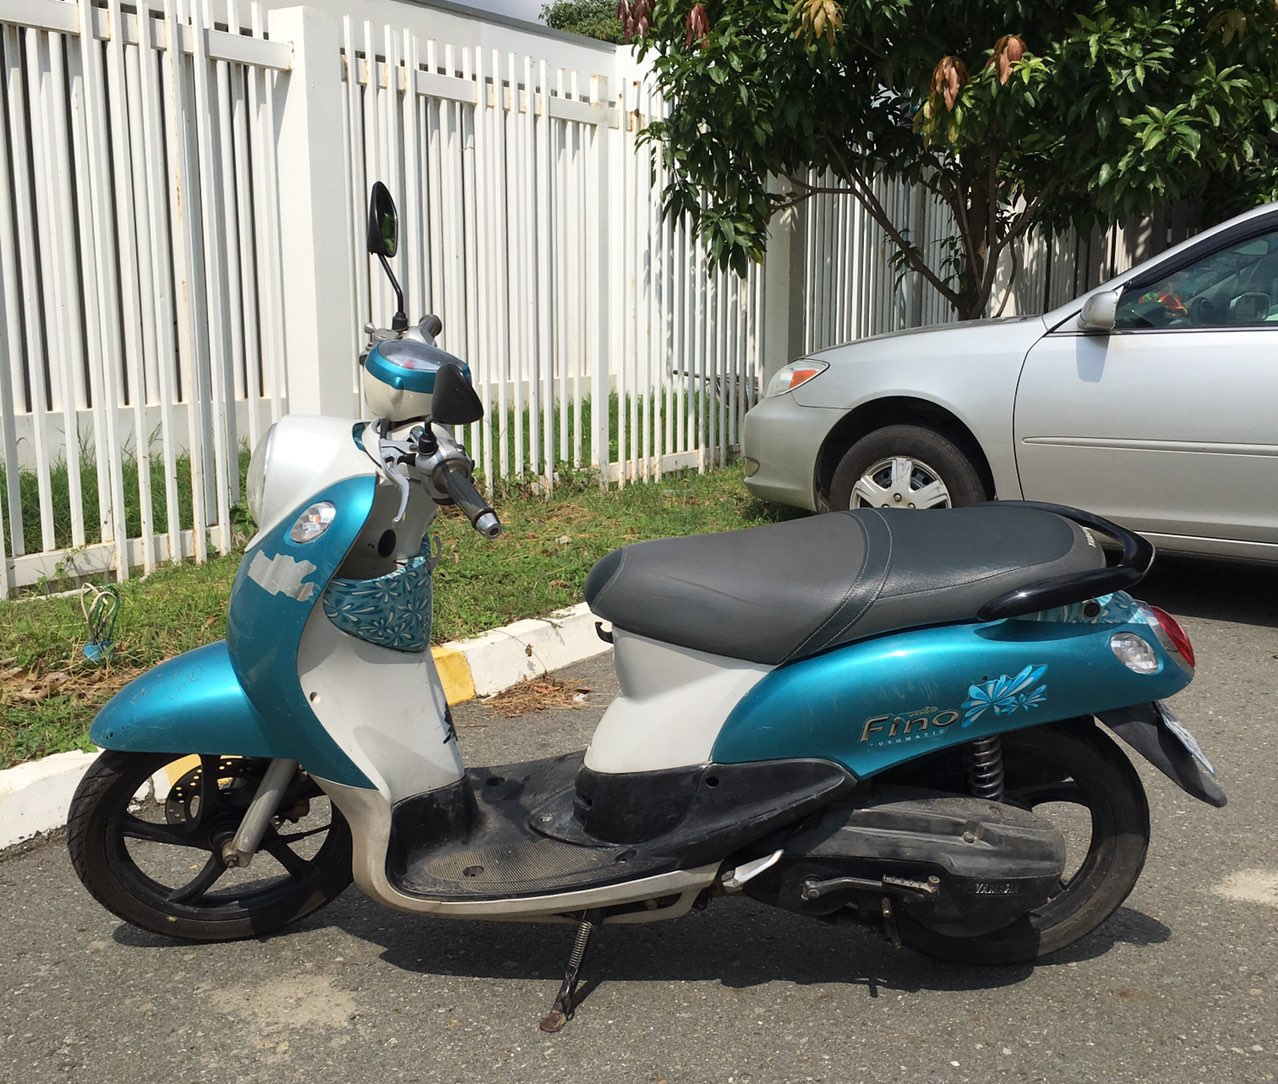 出售一辆Yamaha踏板摩托